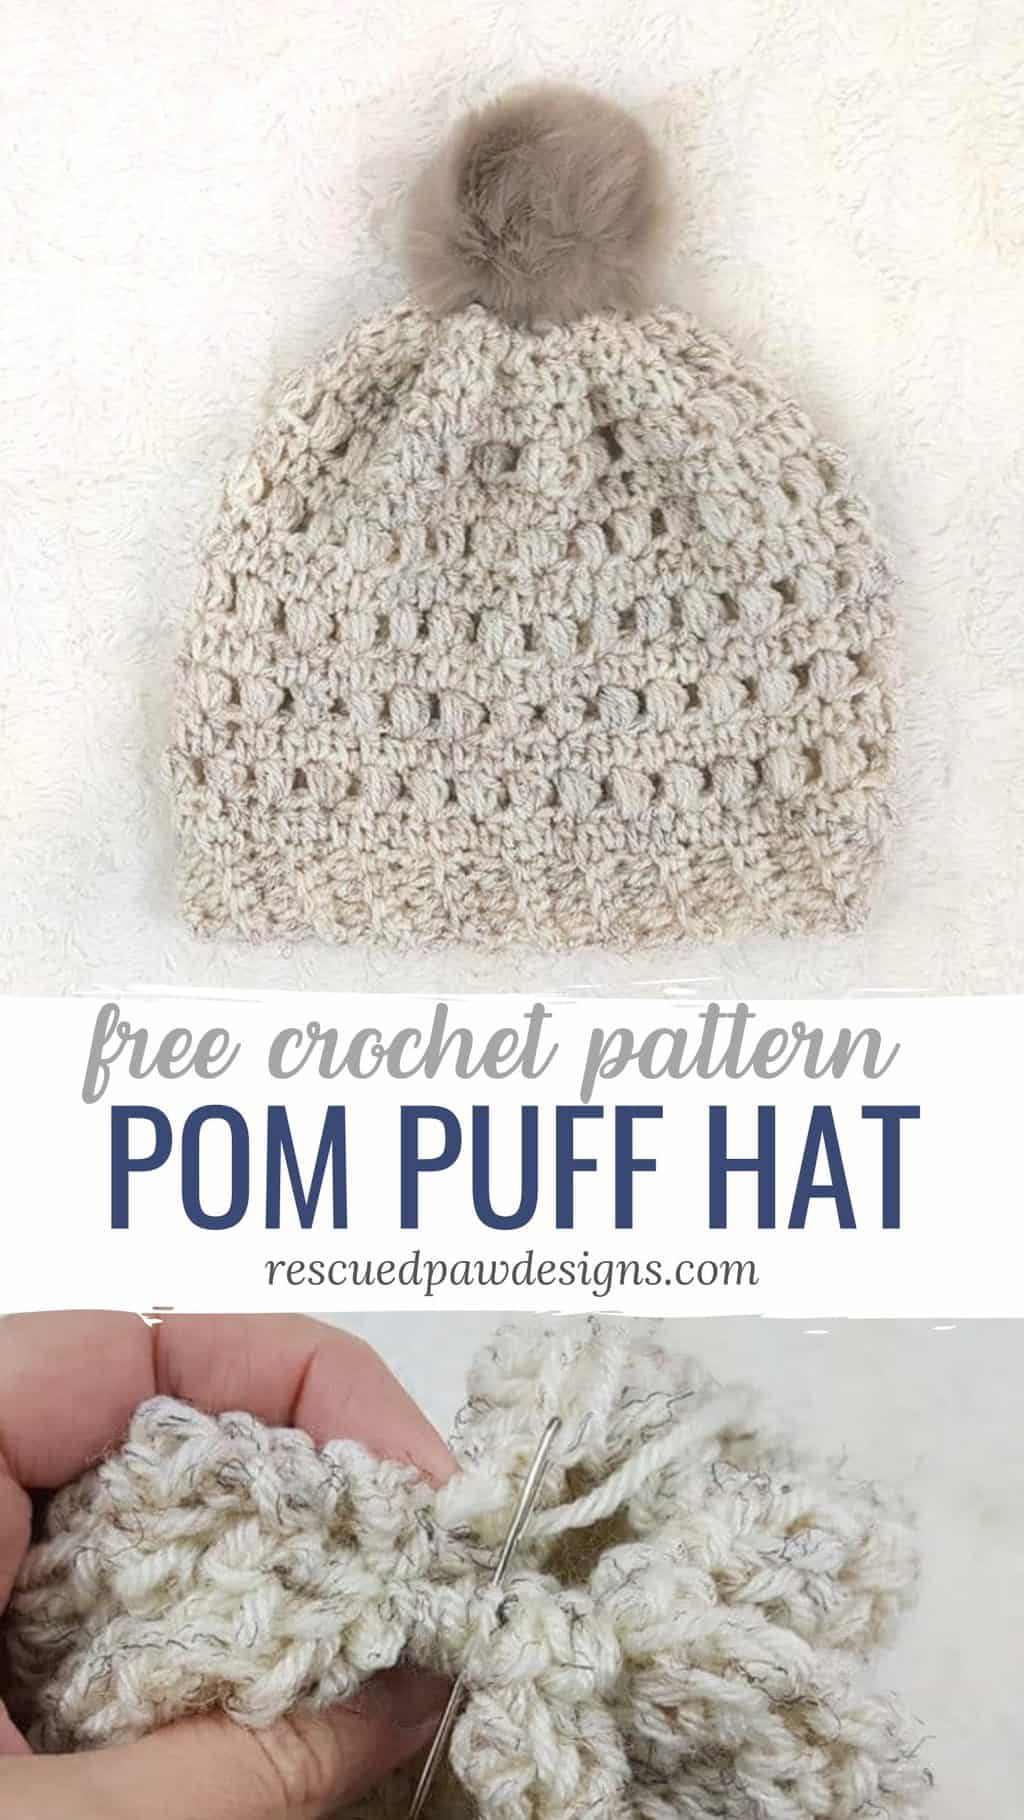 Pom Puff Hat Crochet Pattern